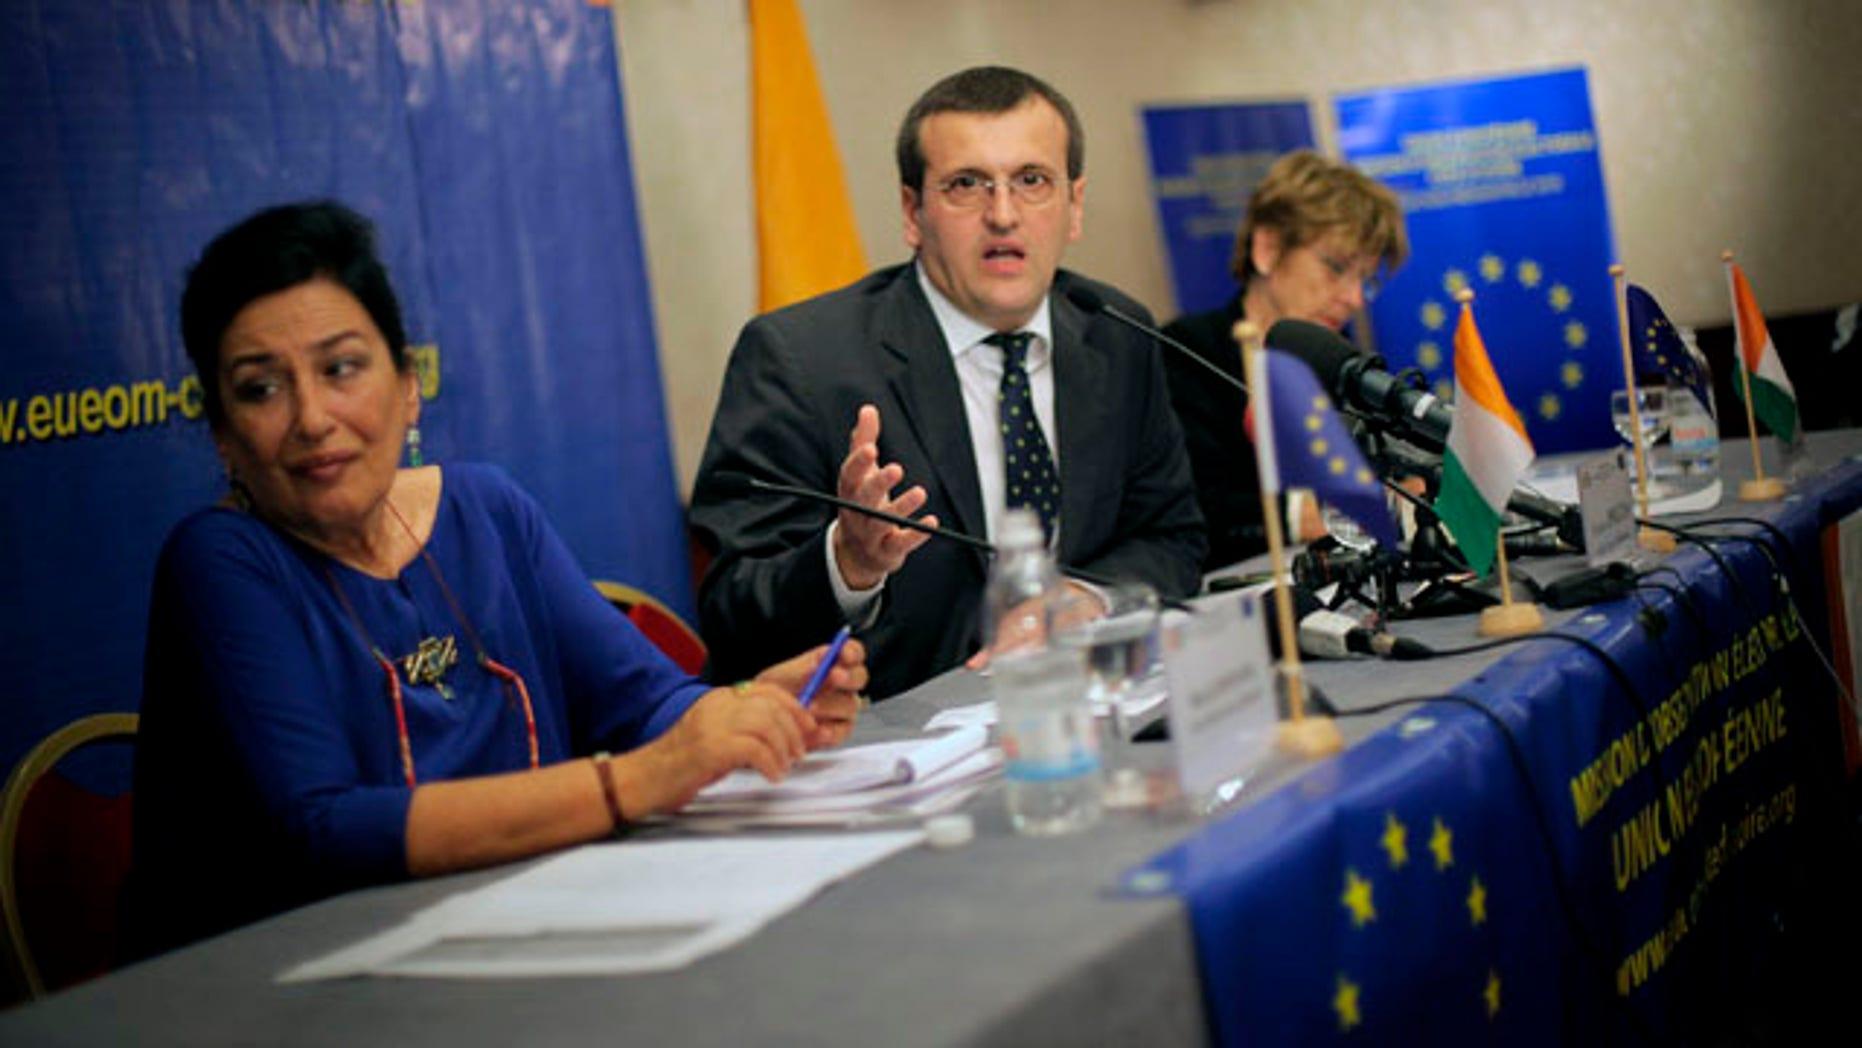 Nov. 2: European Union Chief Elections Observer Cristian Preda, center, from Romania, addresses a news conference in Abidjan, Ivory Coast.